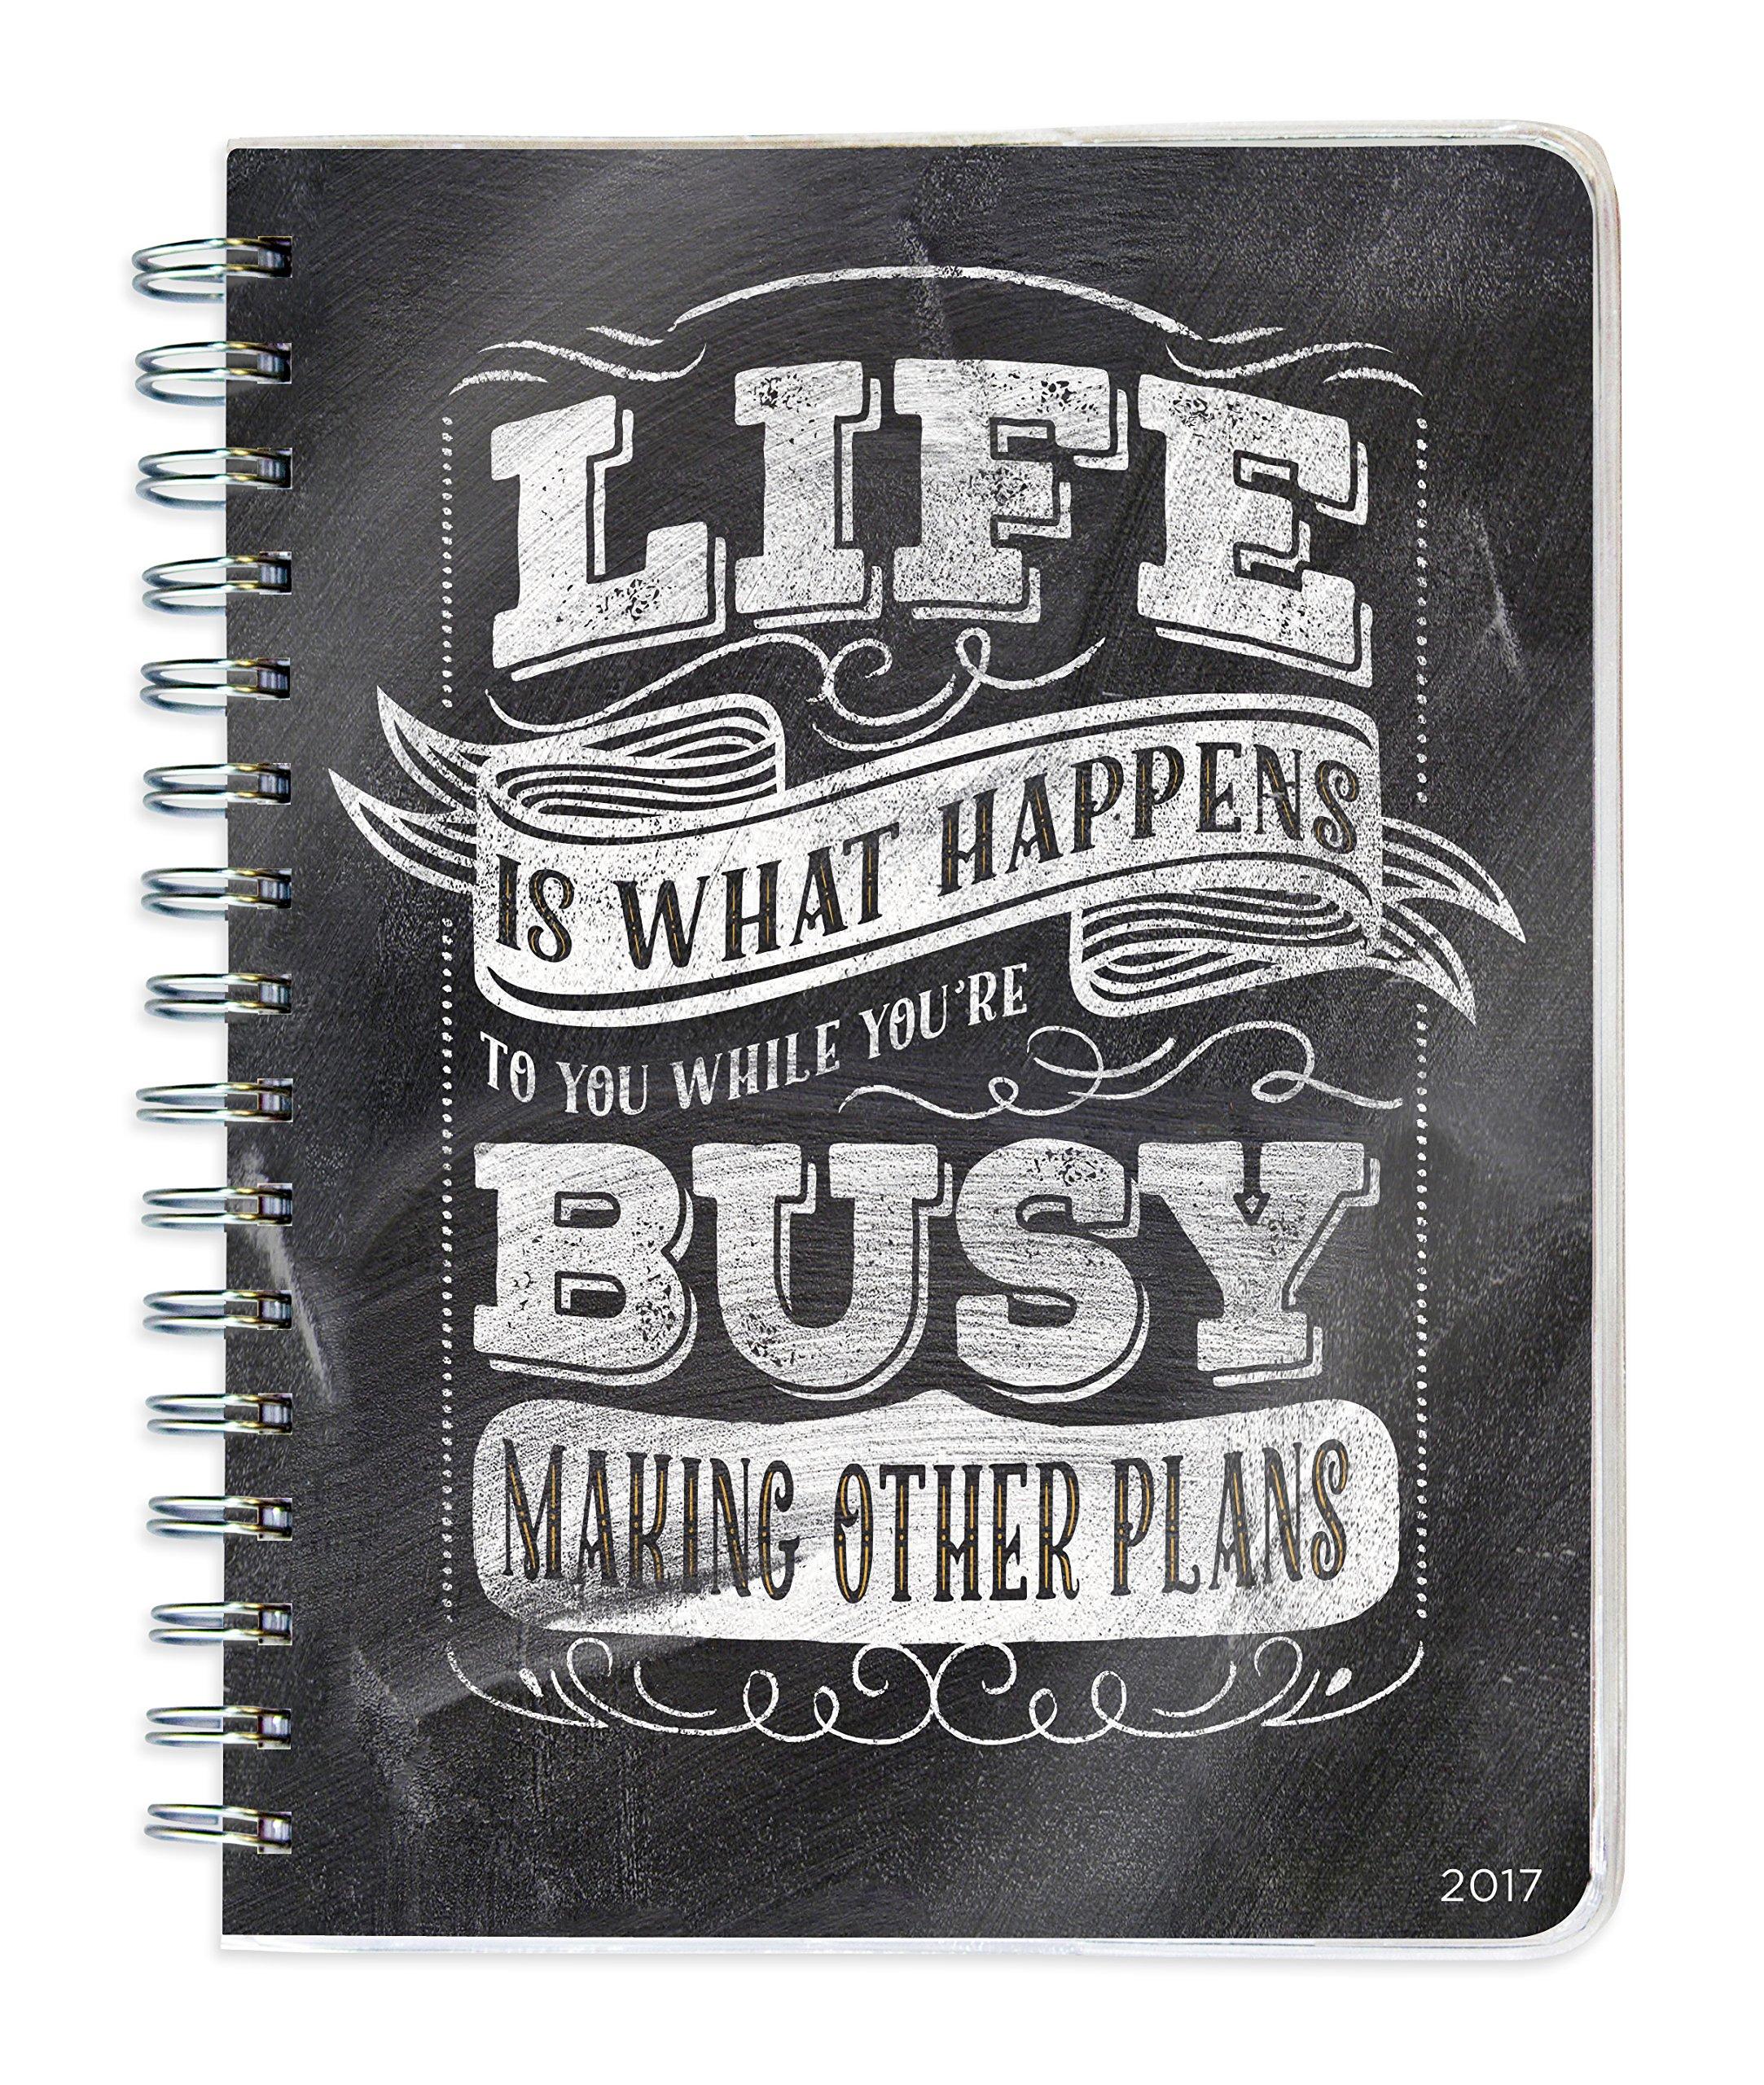 2017 Chalk Plans 12 Month Spiral Engagement Planner: TF ...